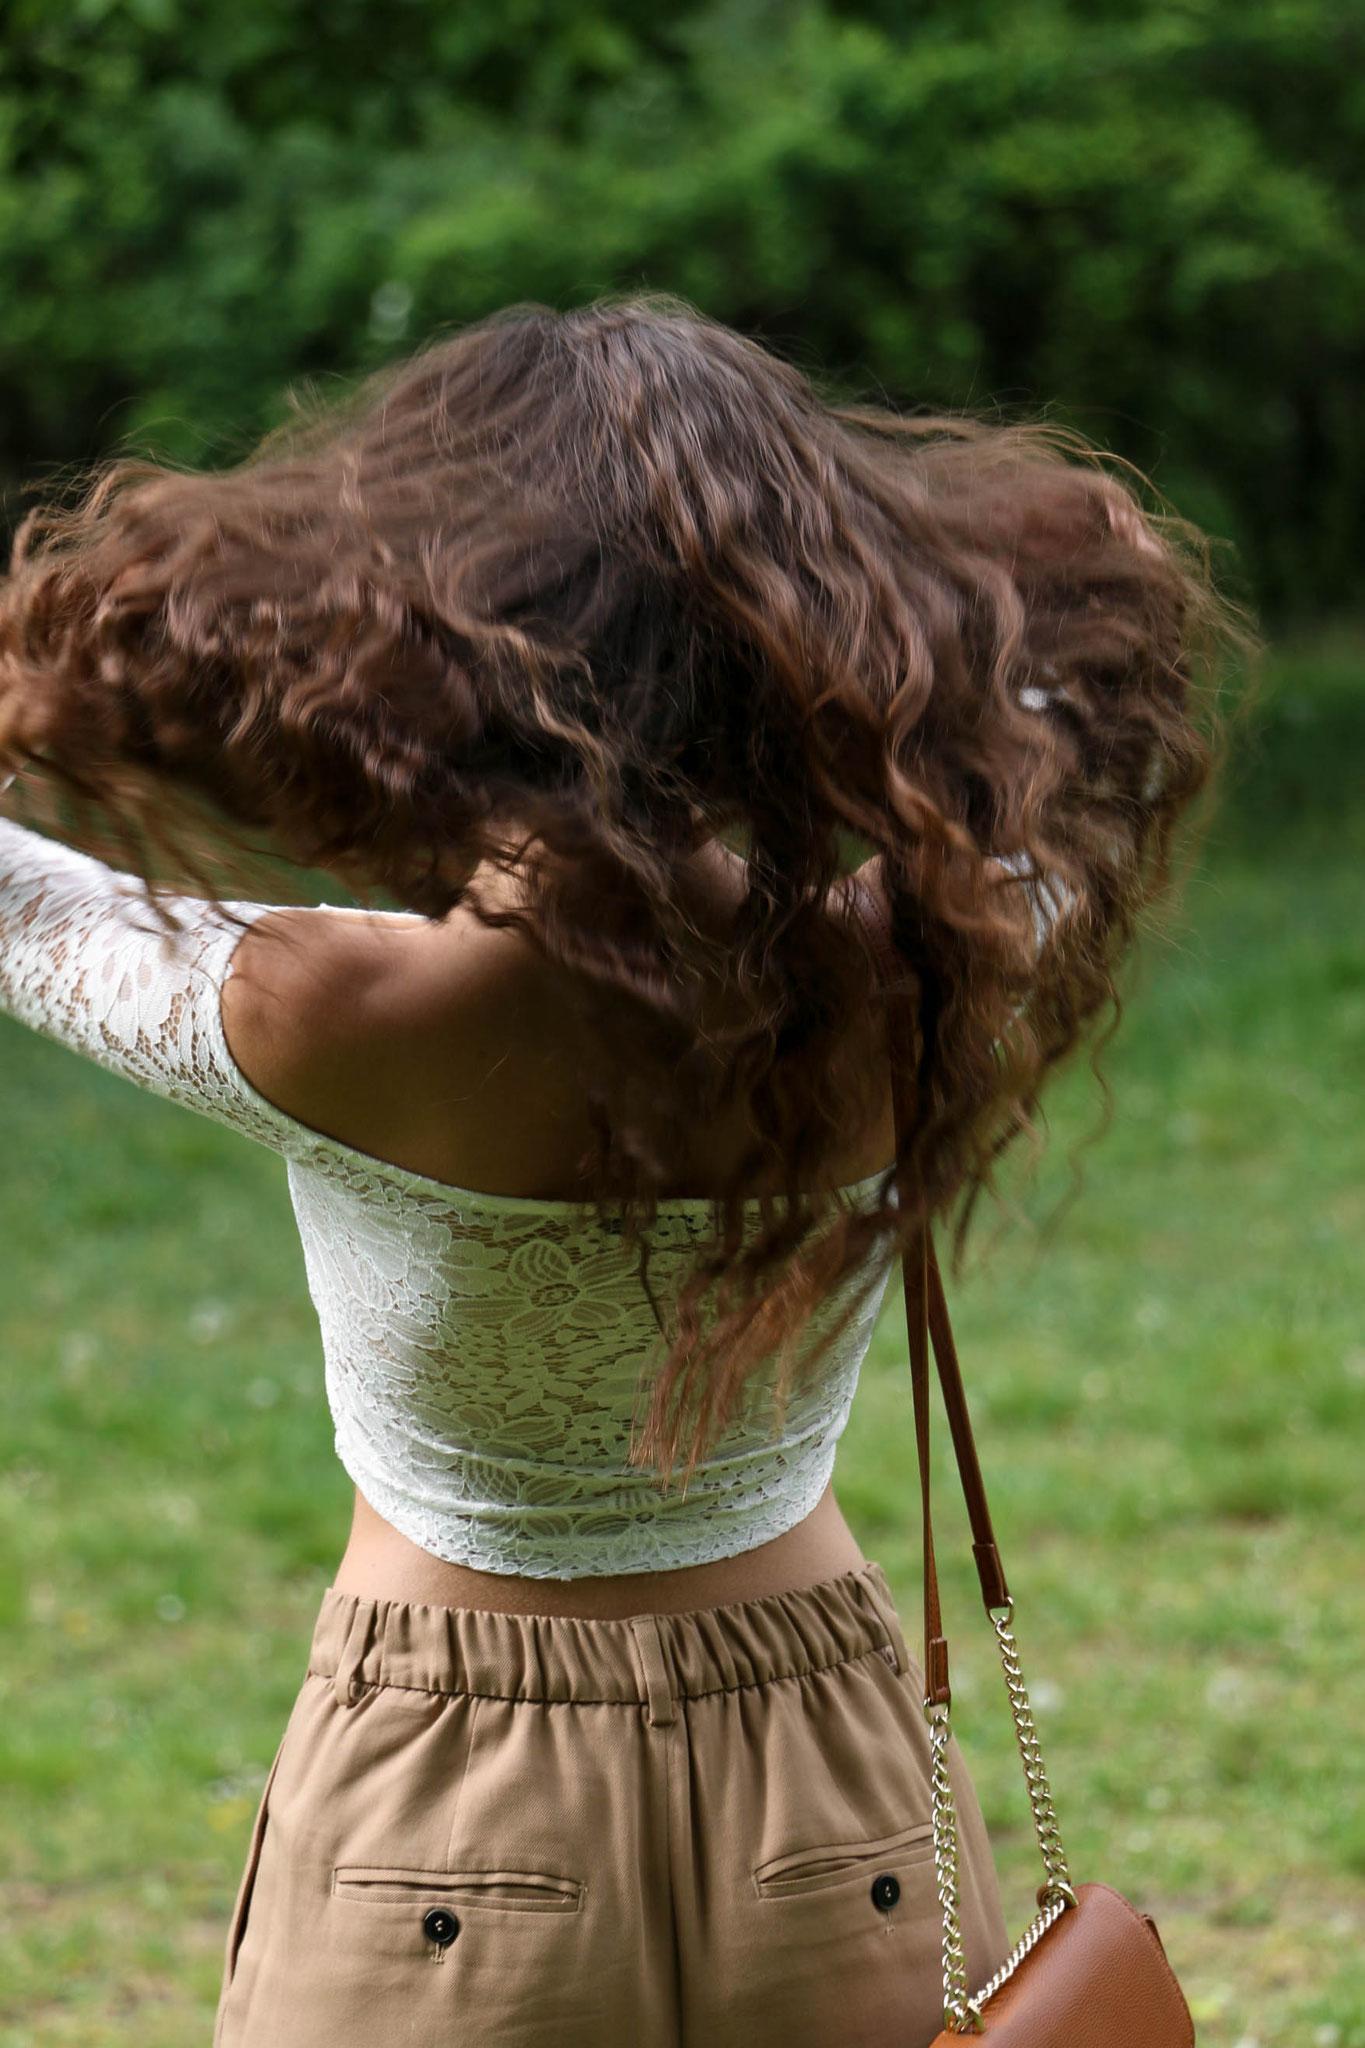 Crop Top, Spring Outfit, Curly Hair, Carmen Schubert